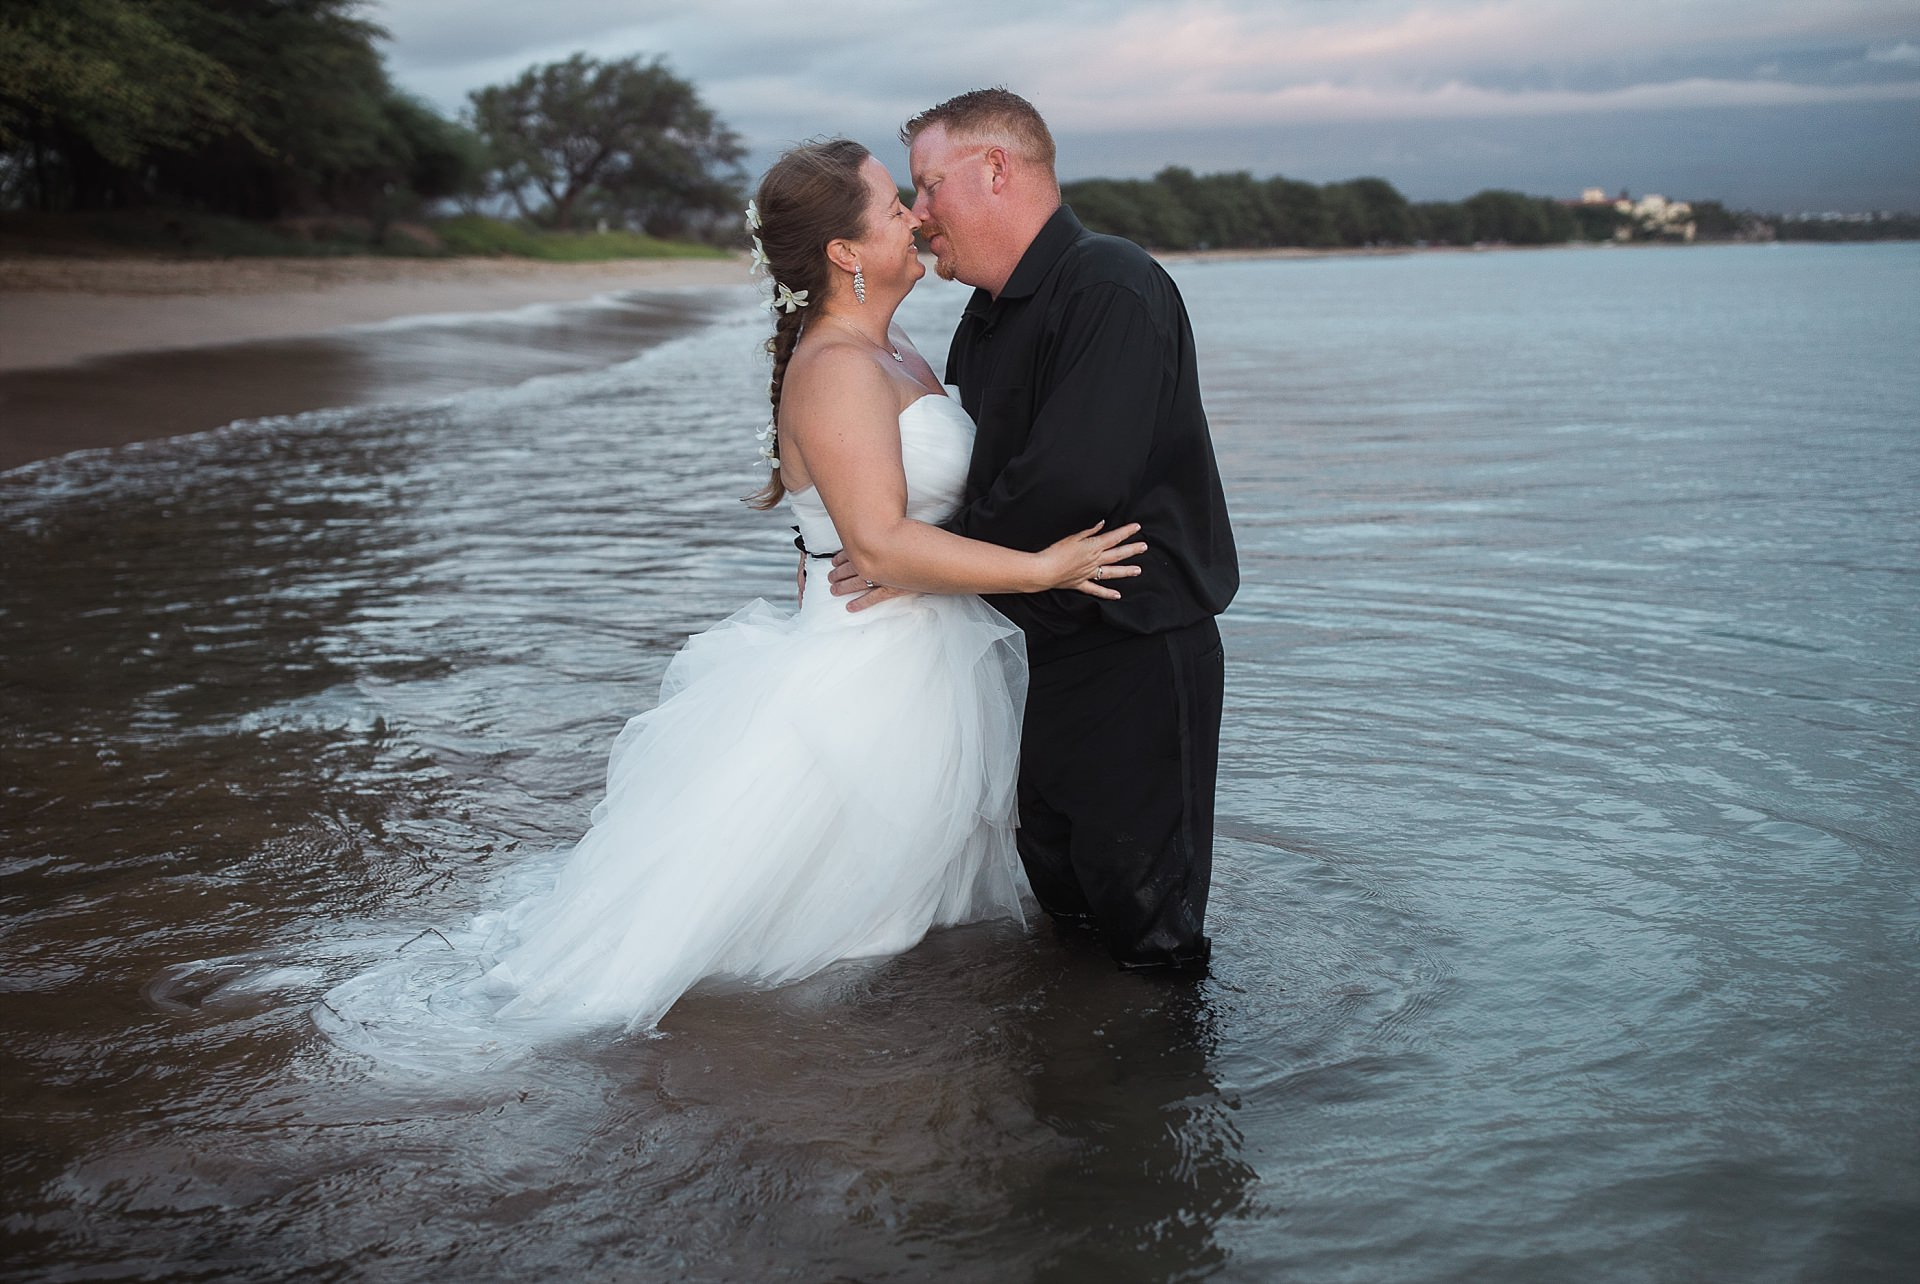 Maui Wedding Beach Portraits